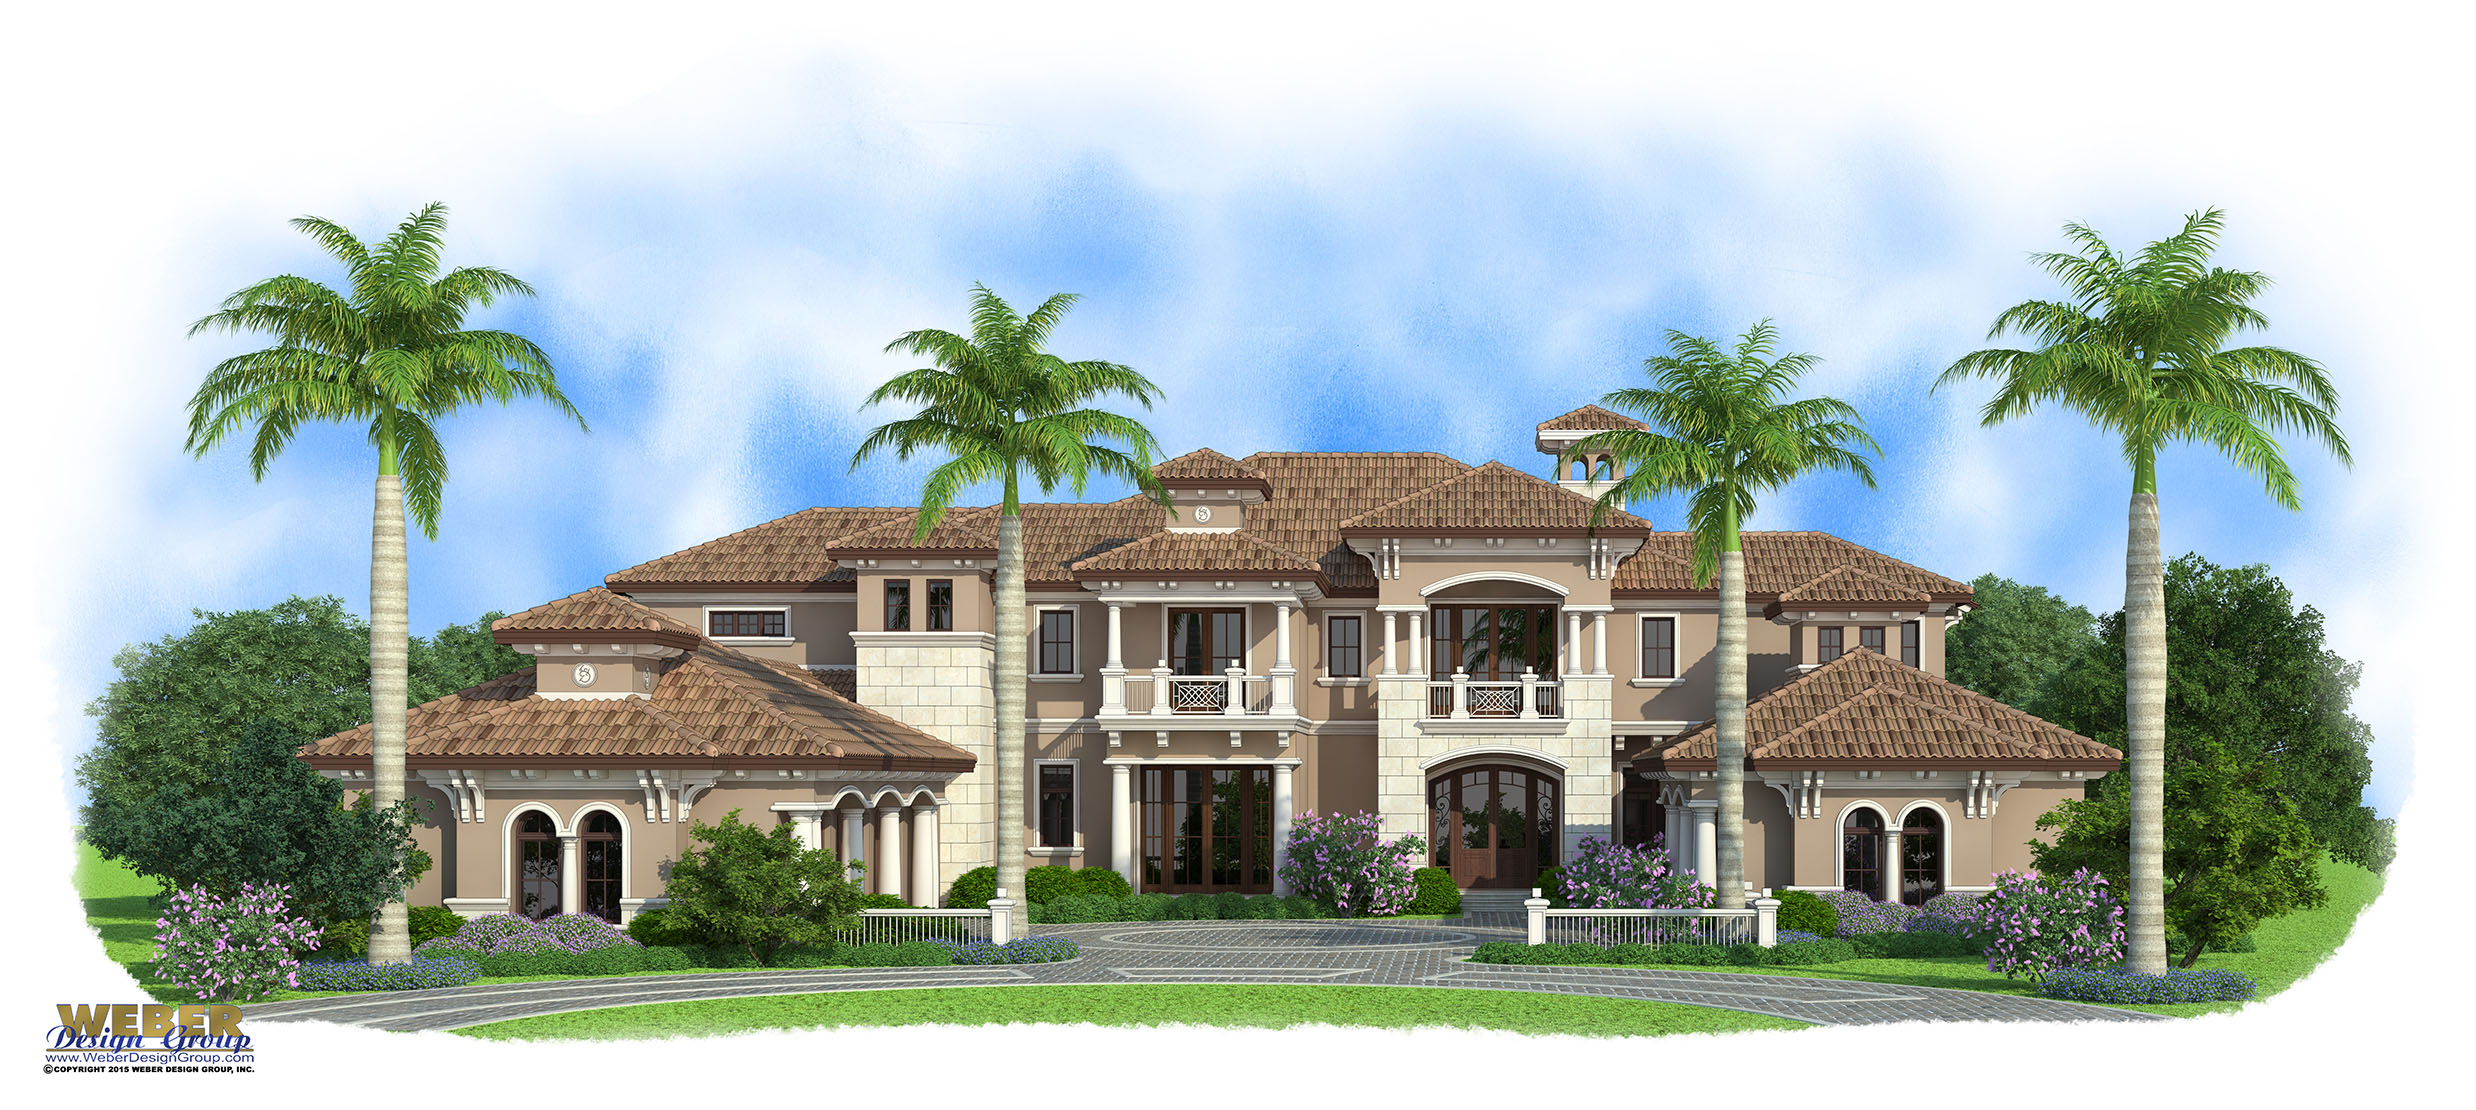 Luxury House Plans Modern Luxury Beach Coastal